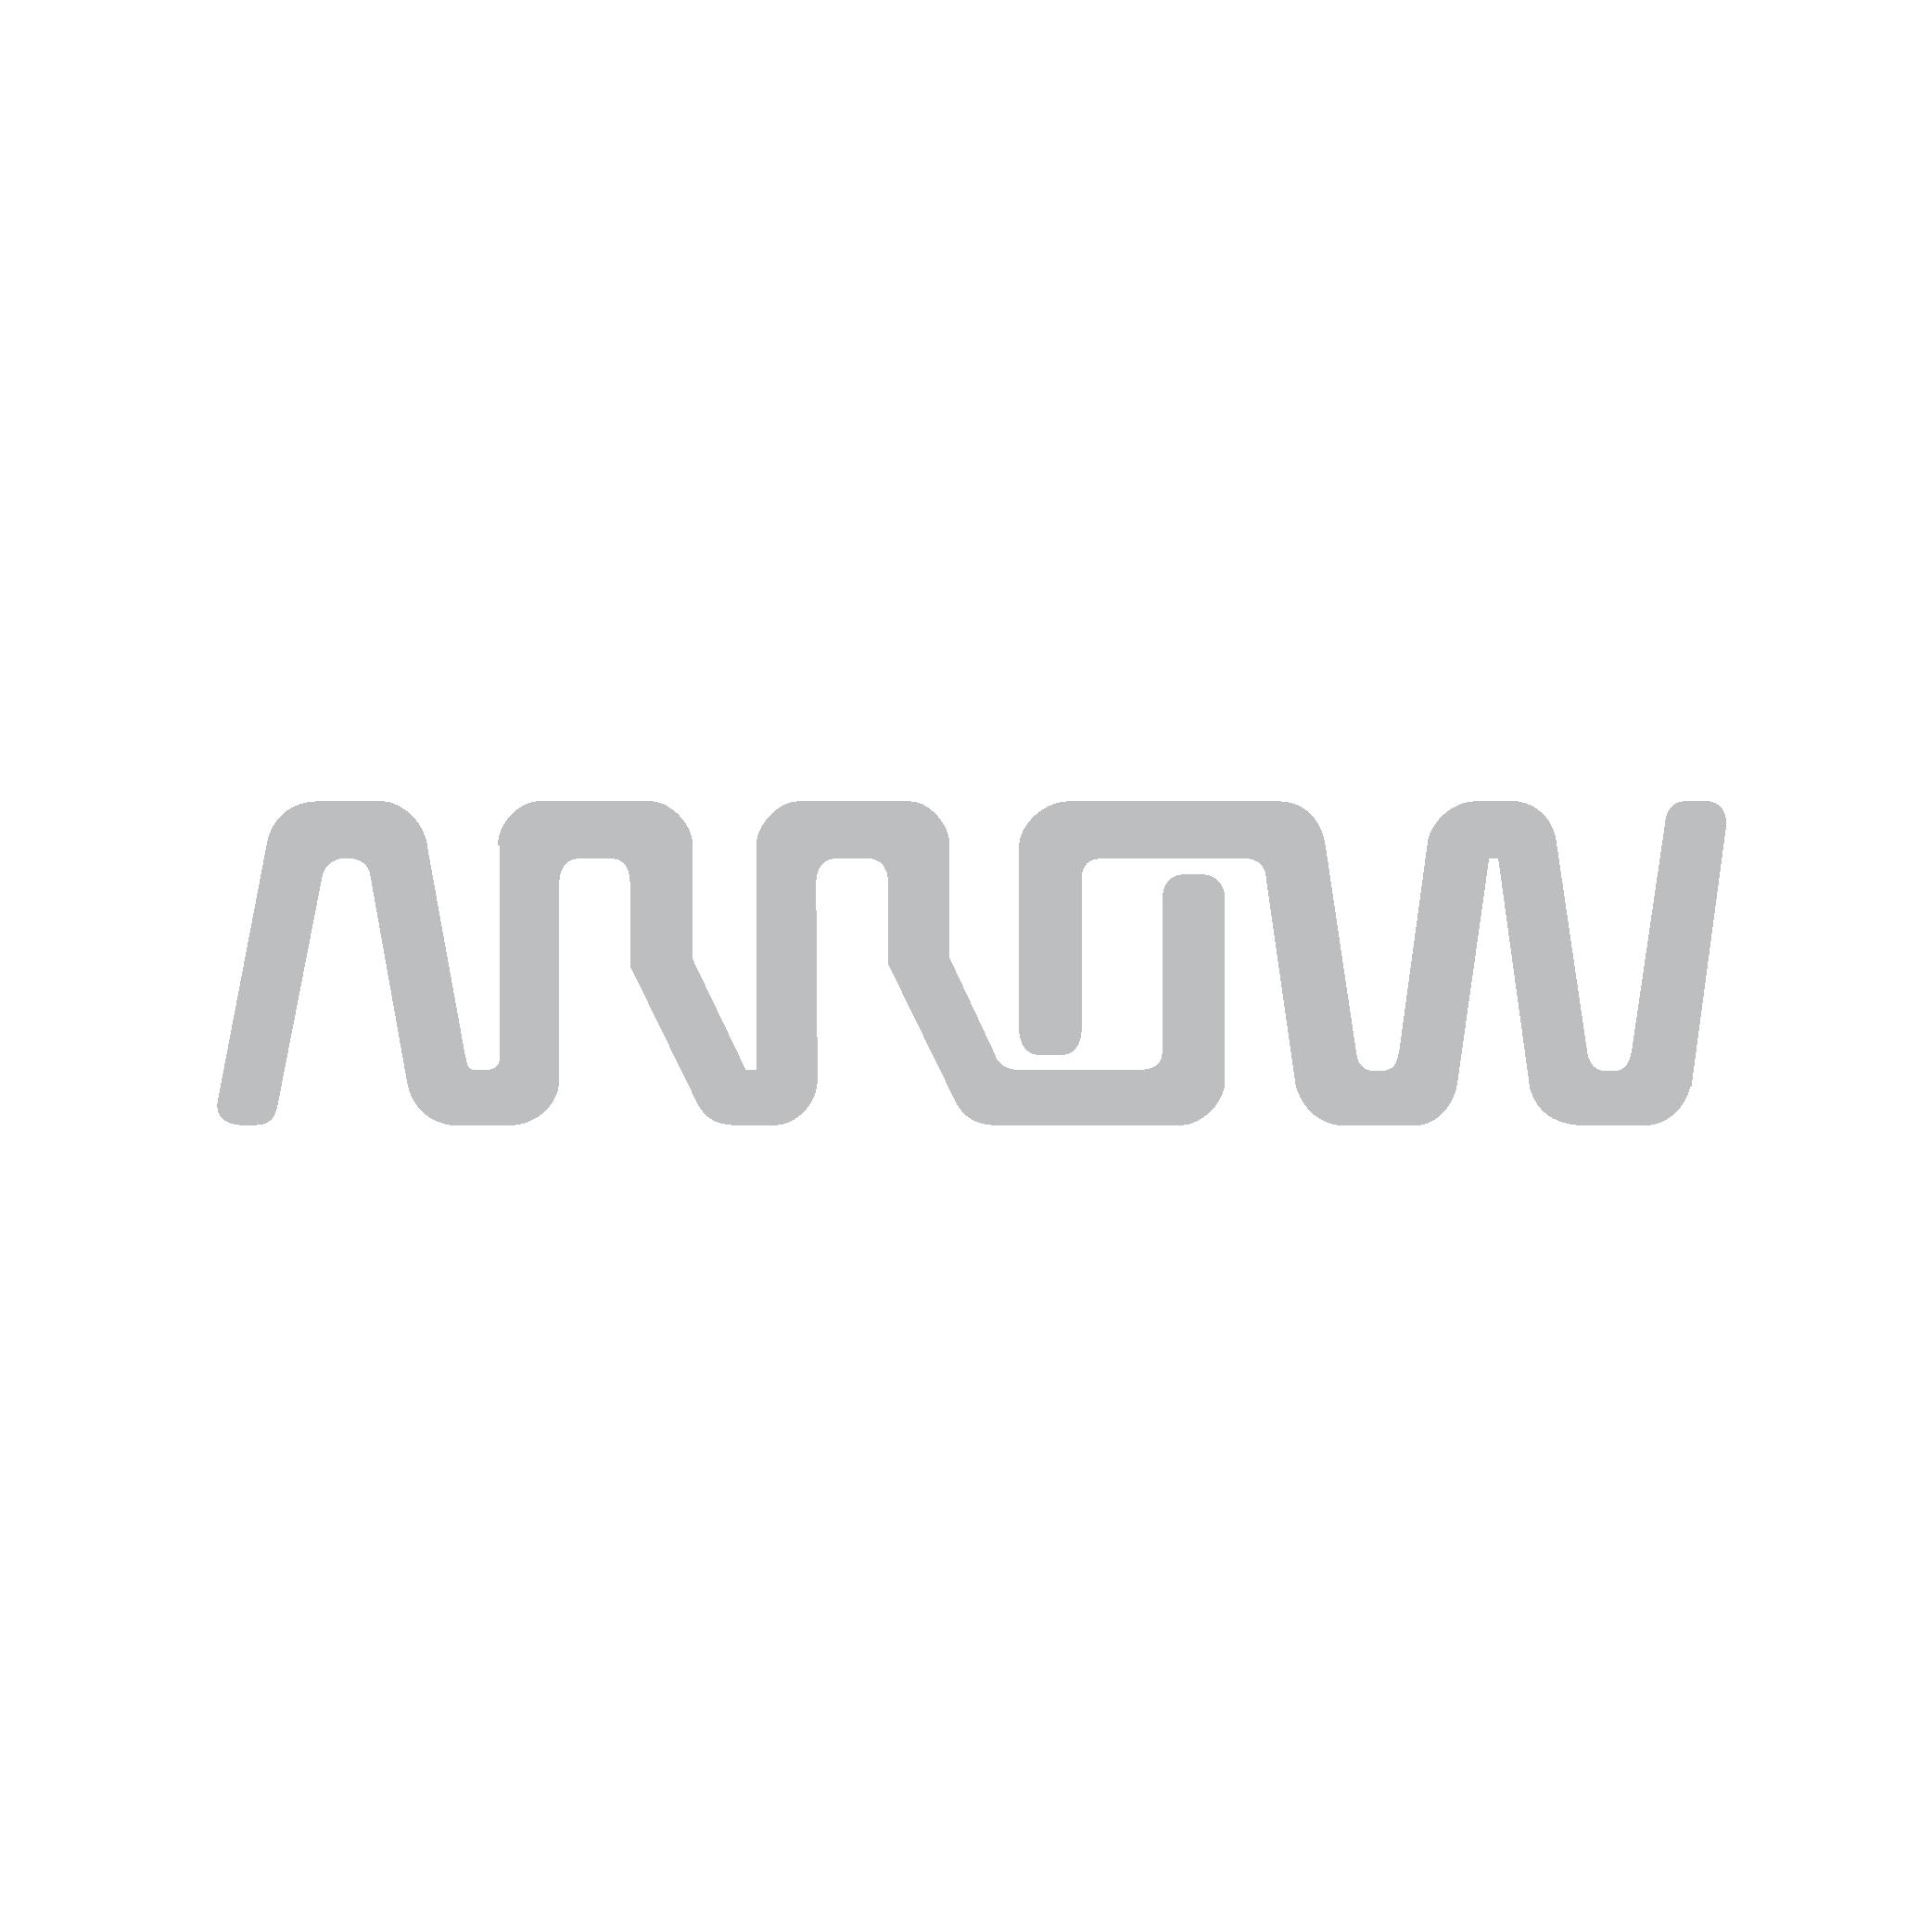 arrow_gray-01.png